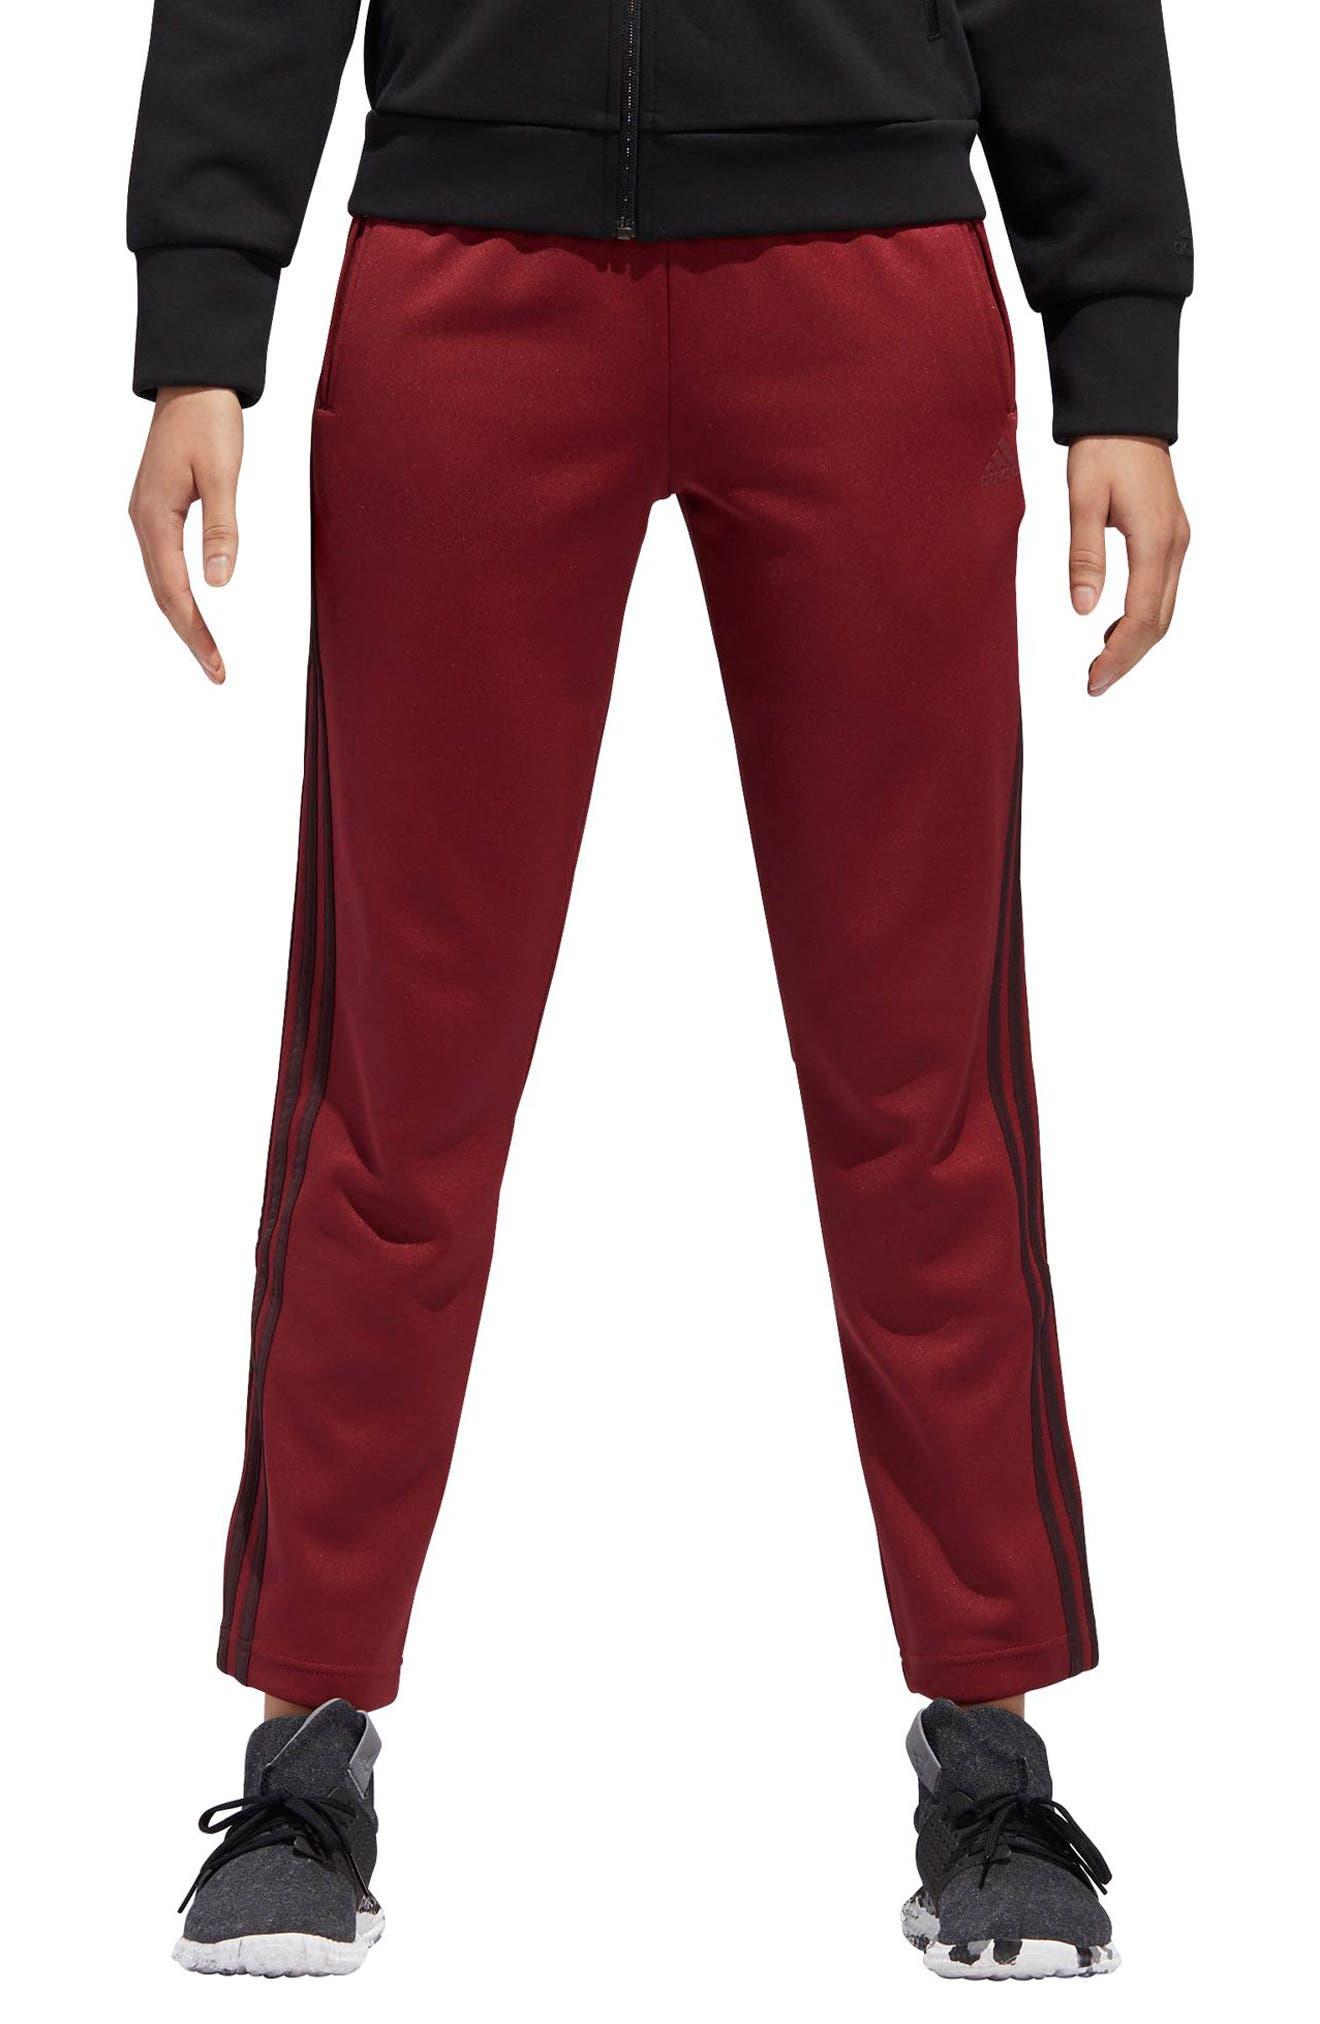 Tricot Snap Pants,                             Main thumbnail 1, color,                             NOBLE MAROON/ NIGHT RED